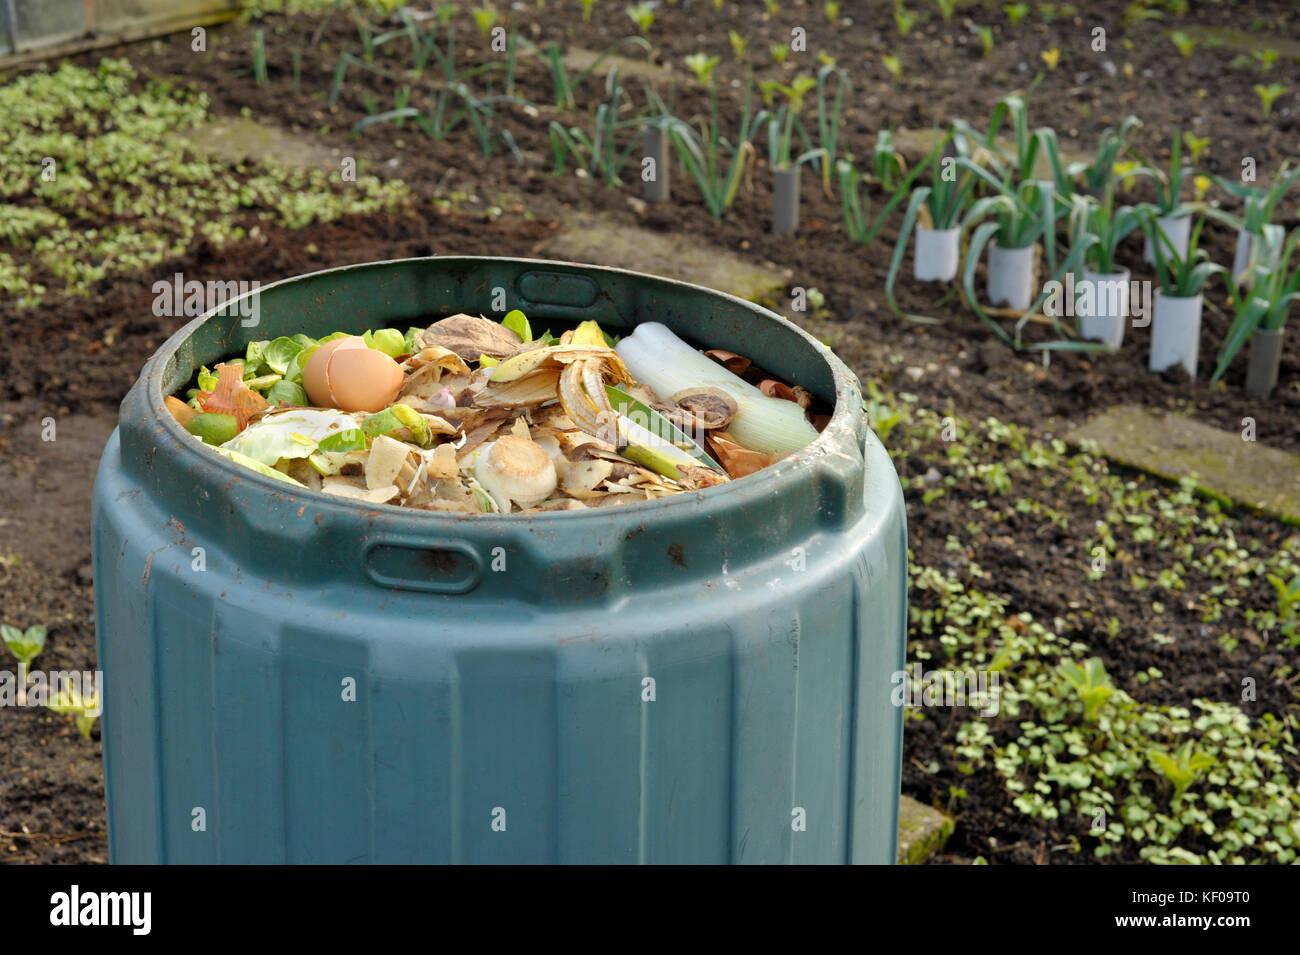 Compost Heap Vegetables Kitchen Waste Stock Photos